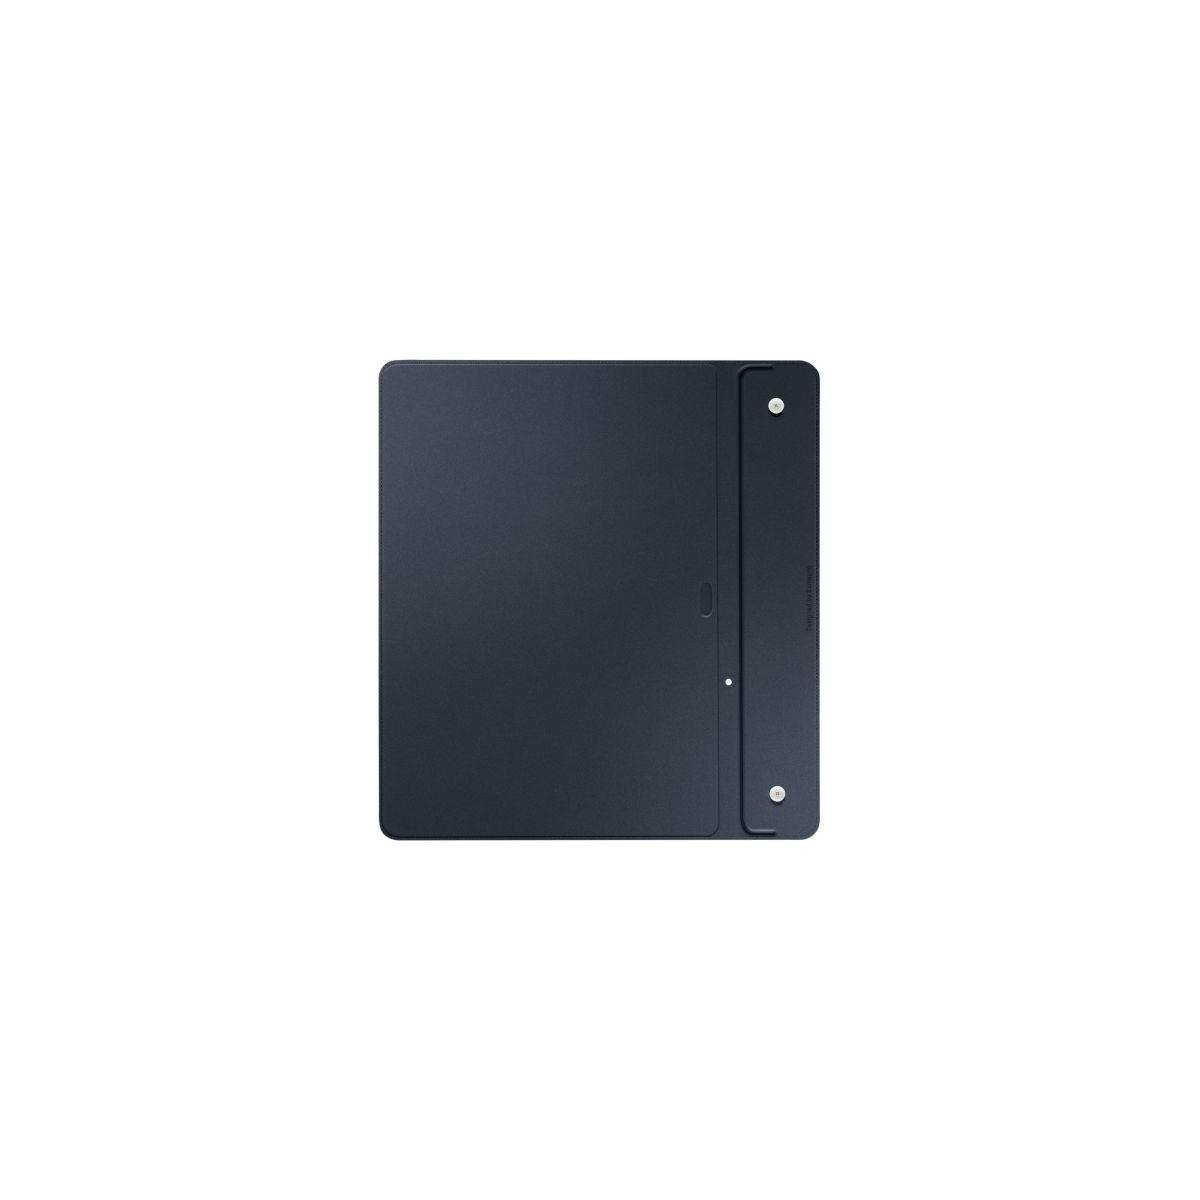 Cover samsung simple cover monaco tab s 10'' noir - livraison offerte : code chronoff (photo)